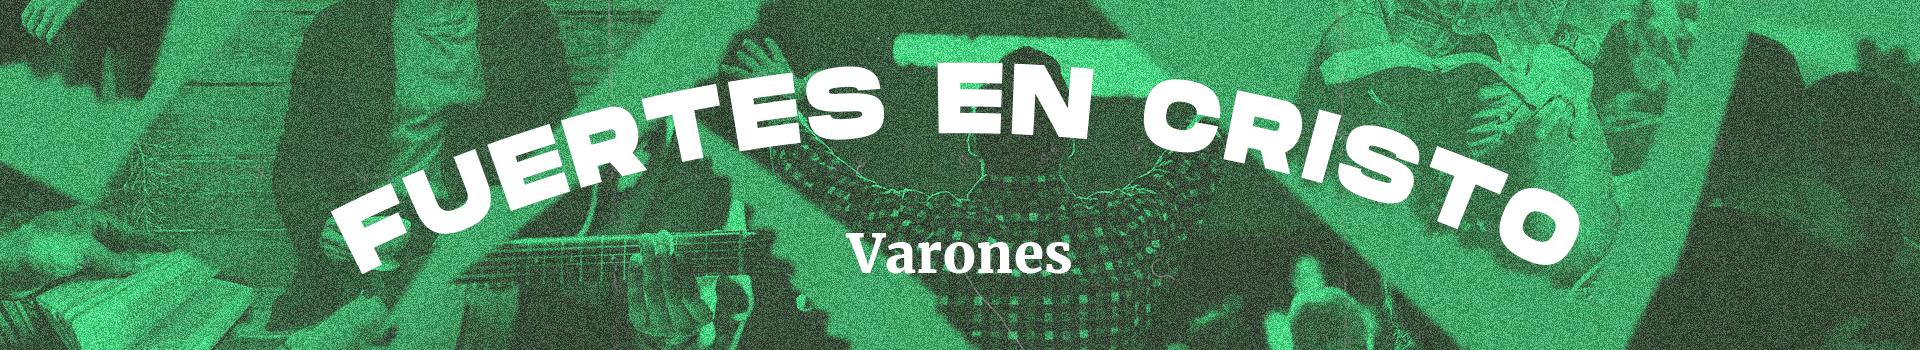 08_varones